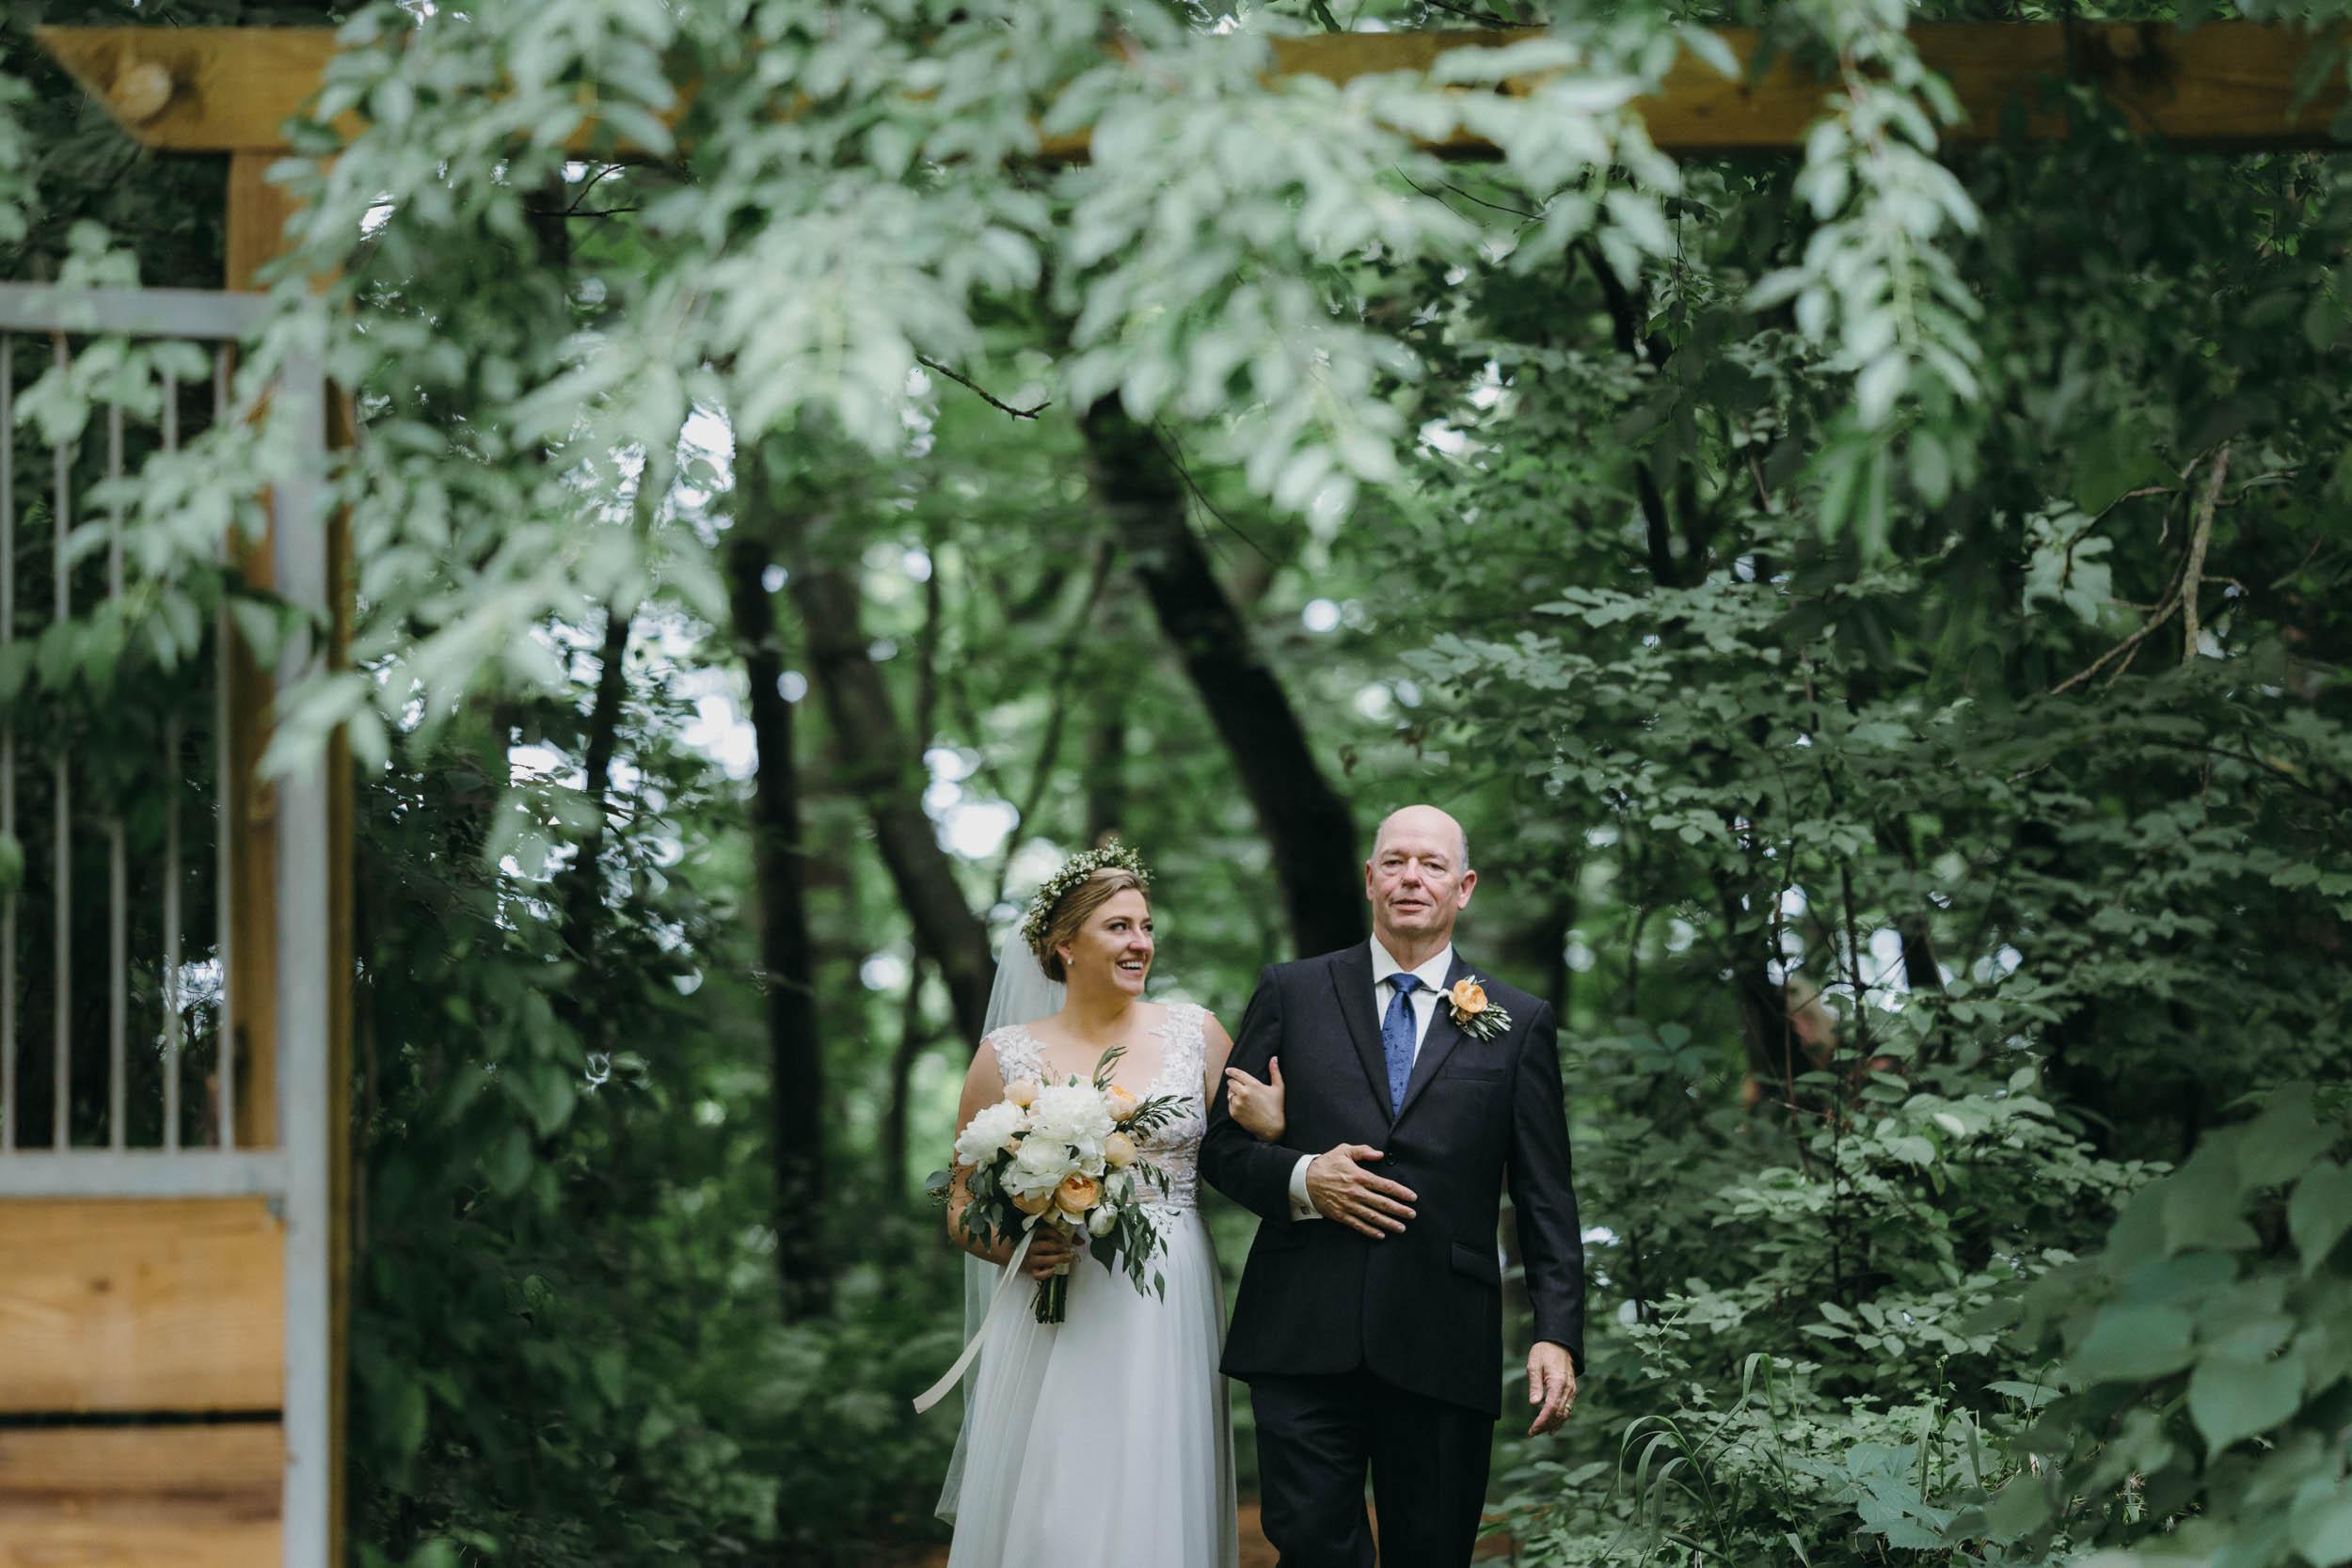 14-minnetonka orchard candid wedding photographer-4.jpg